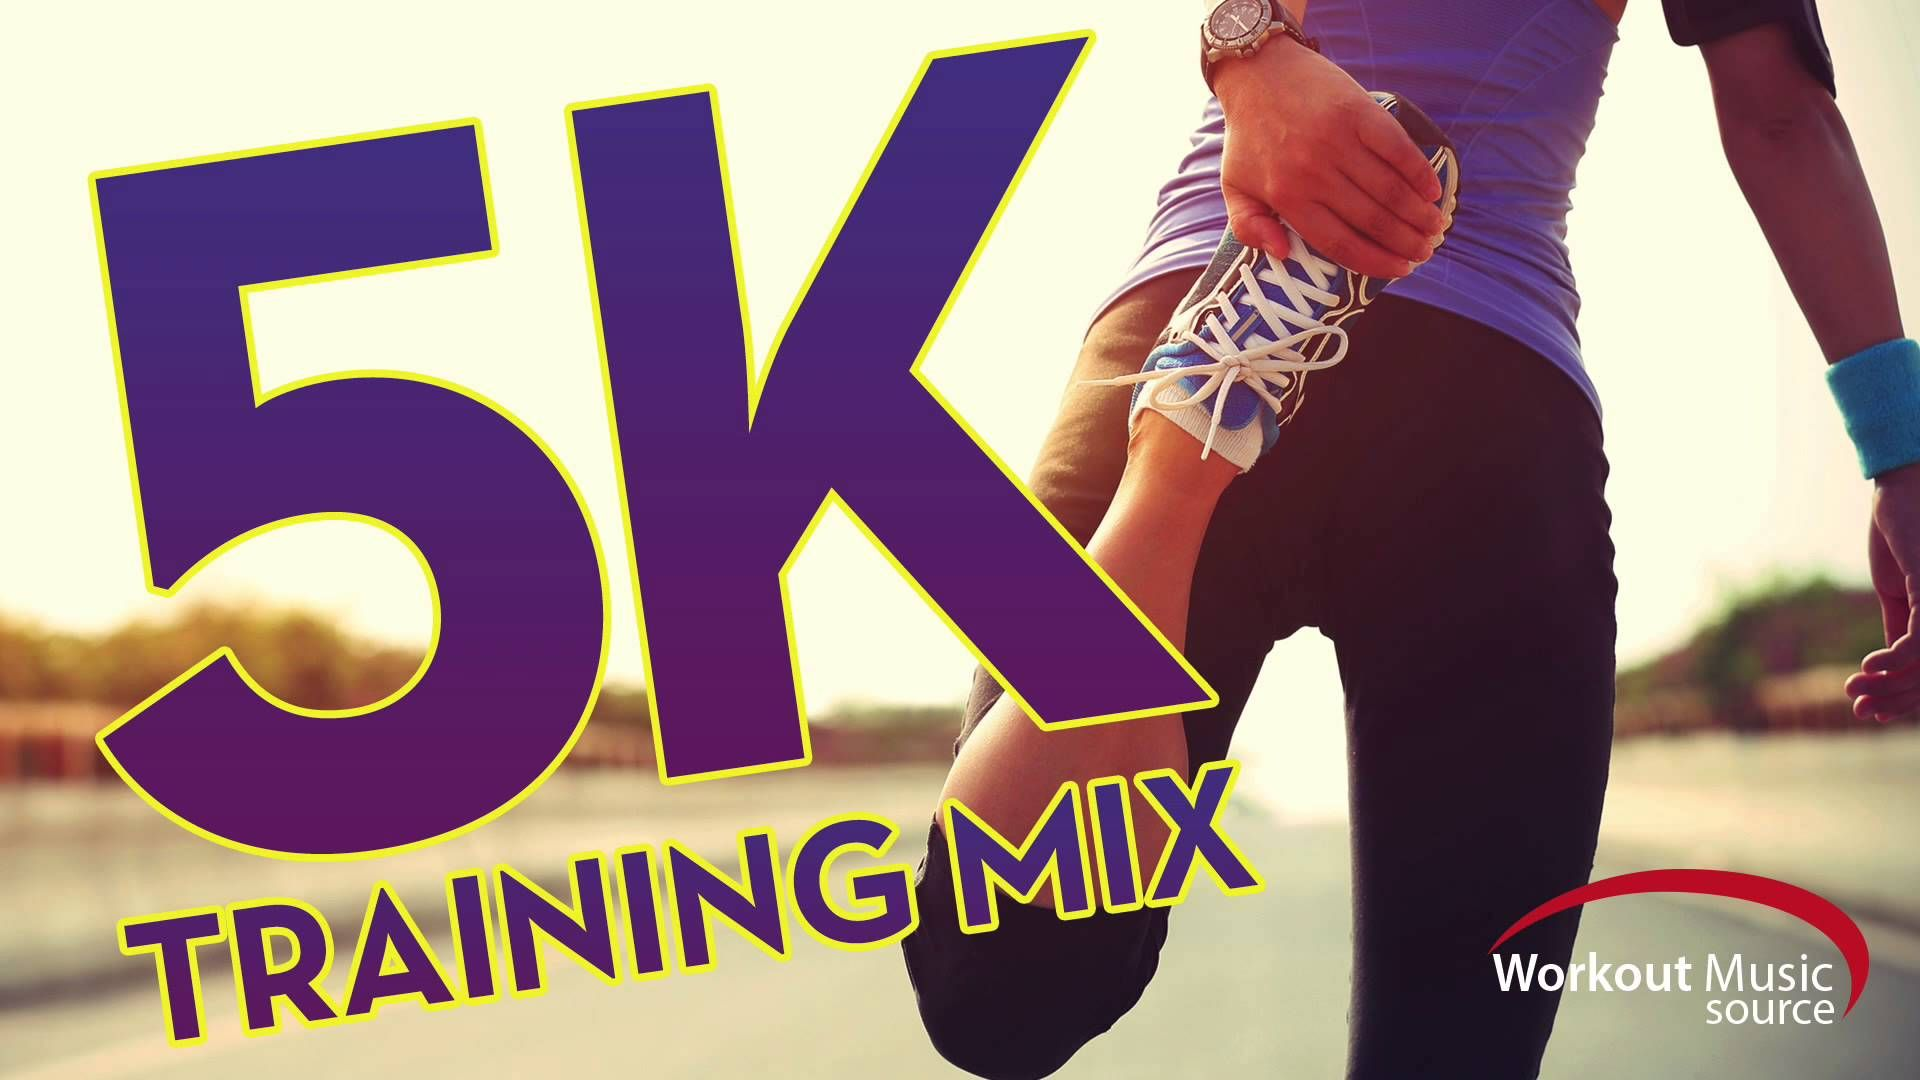 Workout Music Source // 5K Training Mix (30 Min Run-Walk Intervals